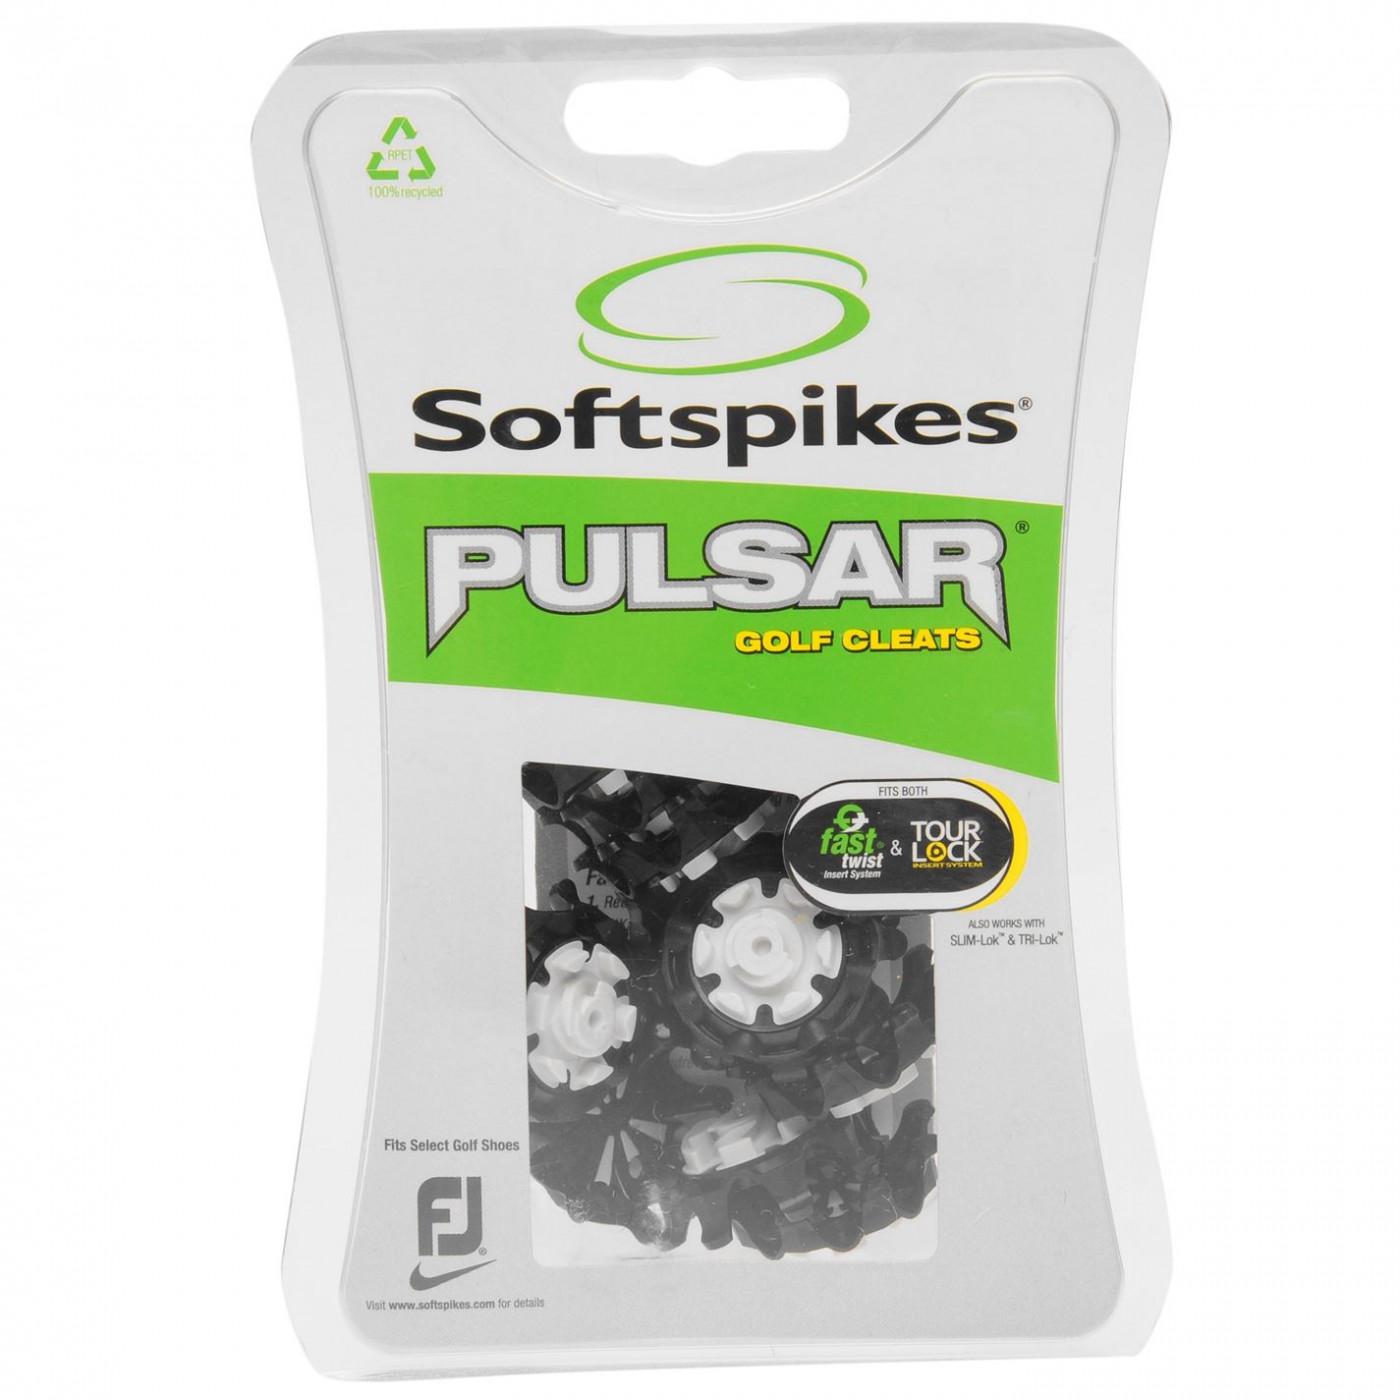 Softspikes Pulsar Spikes